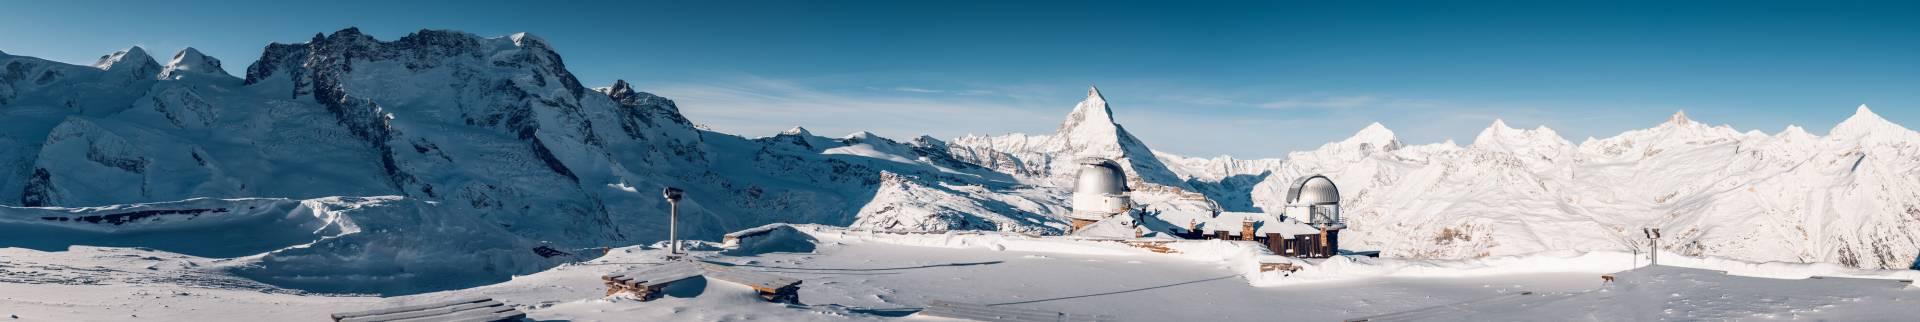 Panoramic view on top of Gornergrat in Winter